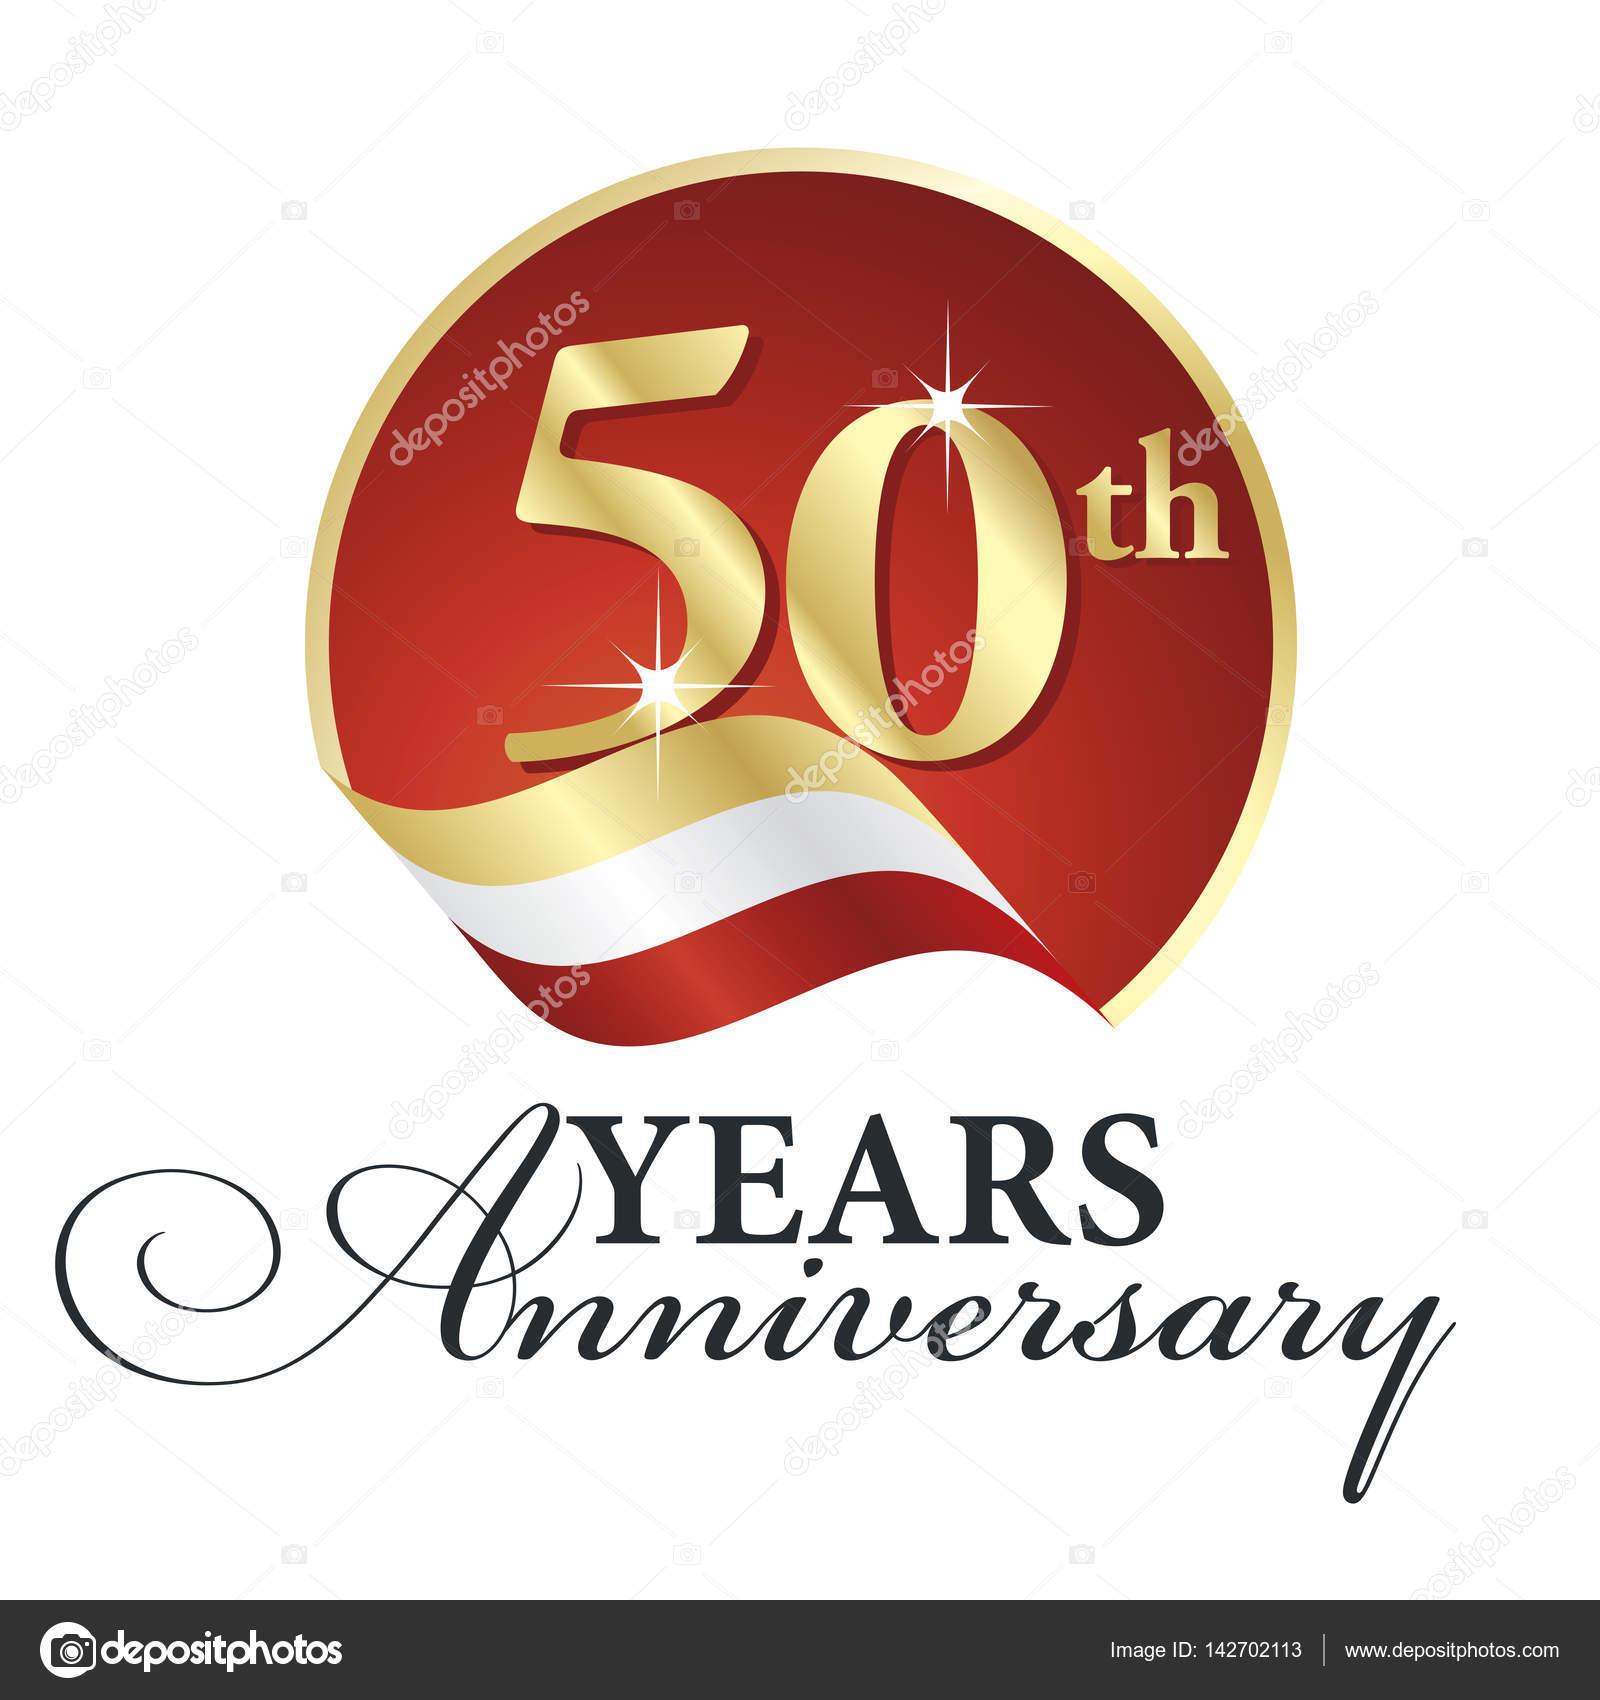 Verjaardag 50 Th Jaren Vieren Logo Goud Wit Rood Lint Achtergrond